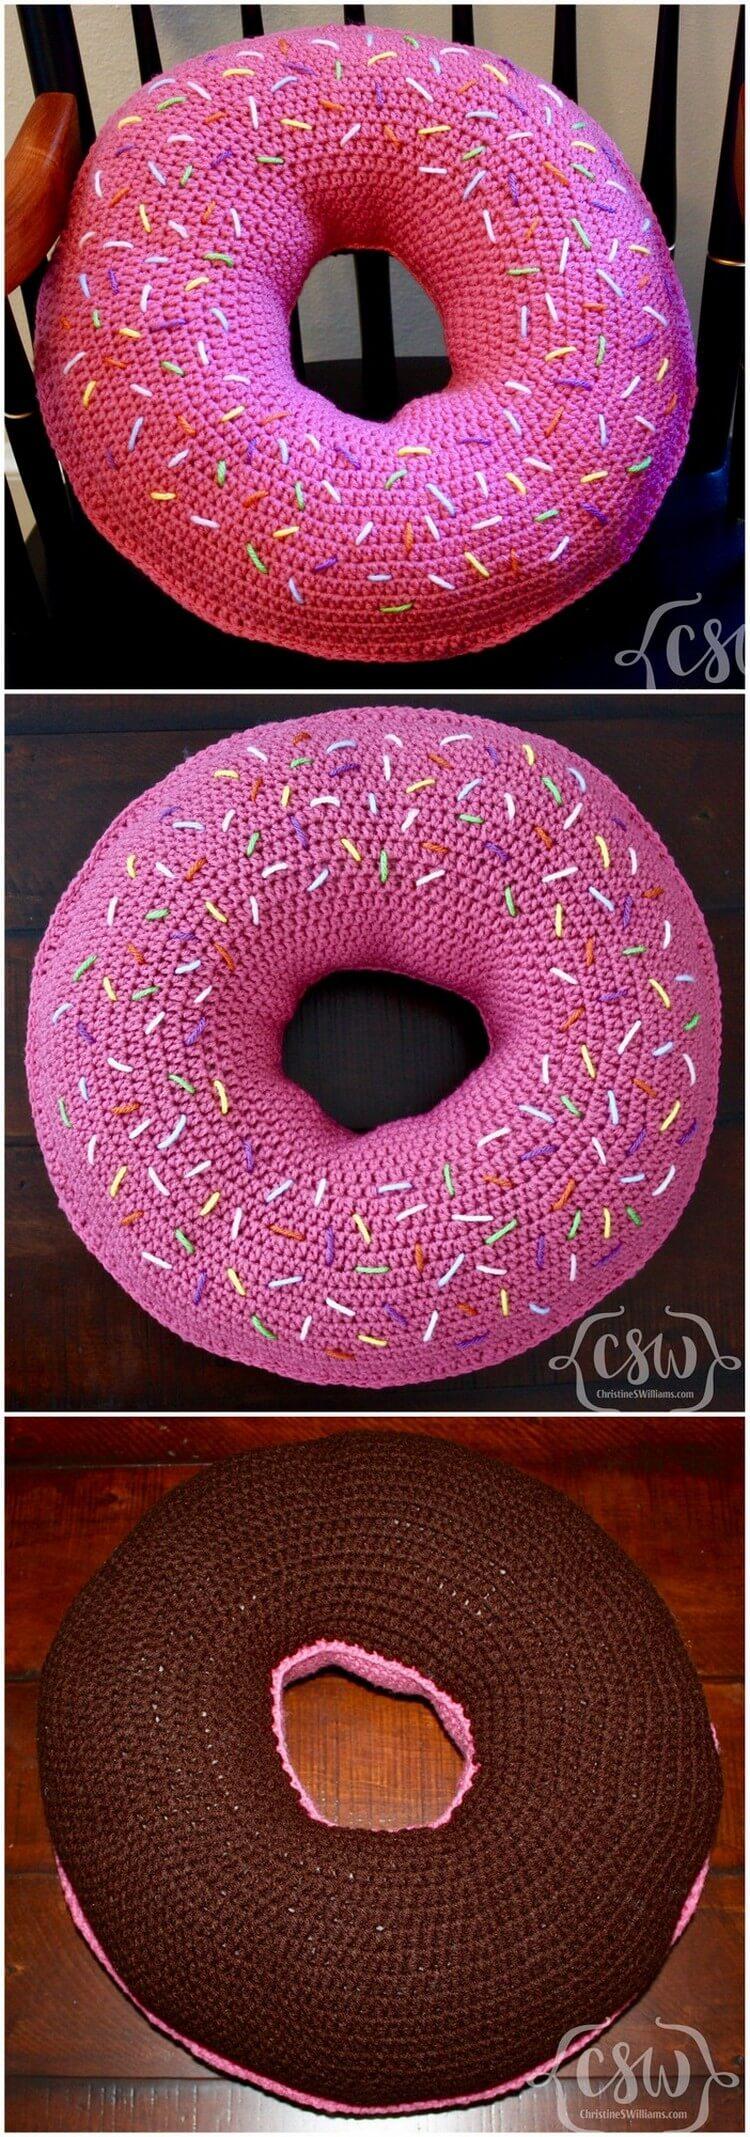 Crochet Pillow Free Pattern (7)